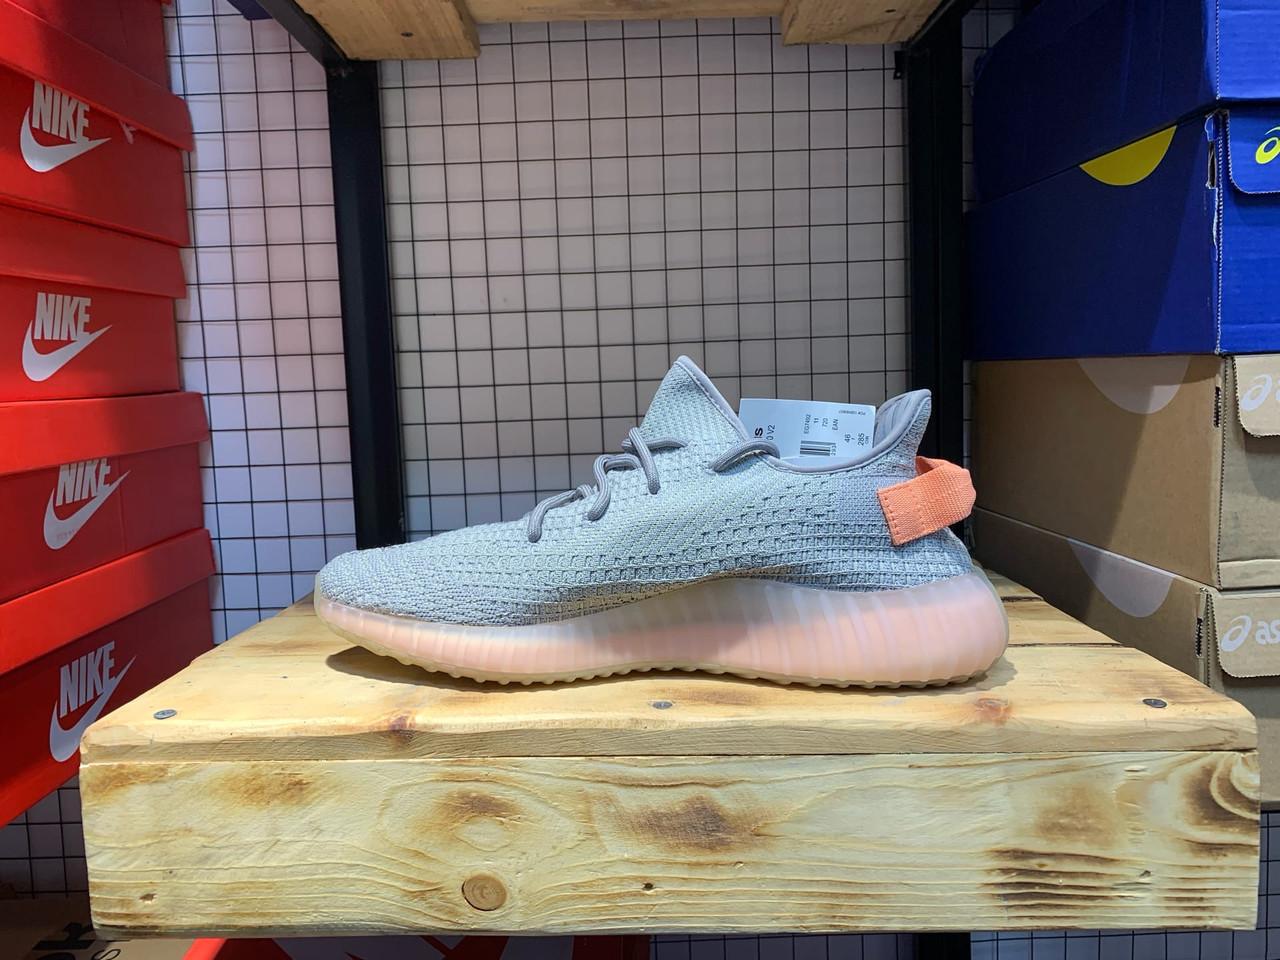 Кроссовки Adidas Yeezy Boost 350 V2 - фото 3